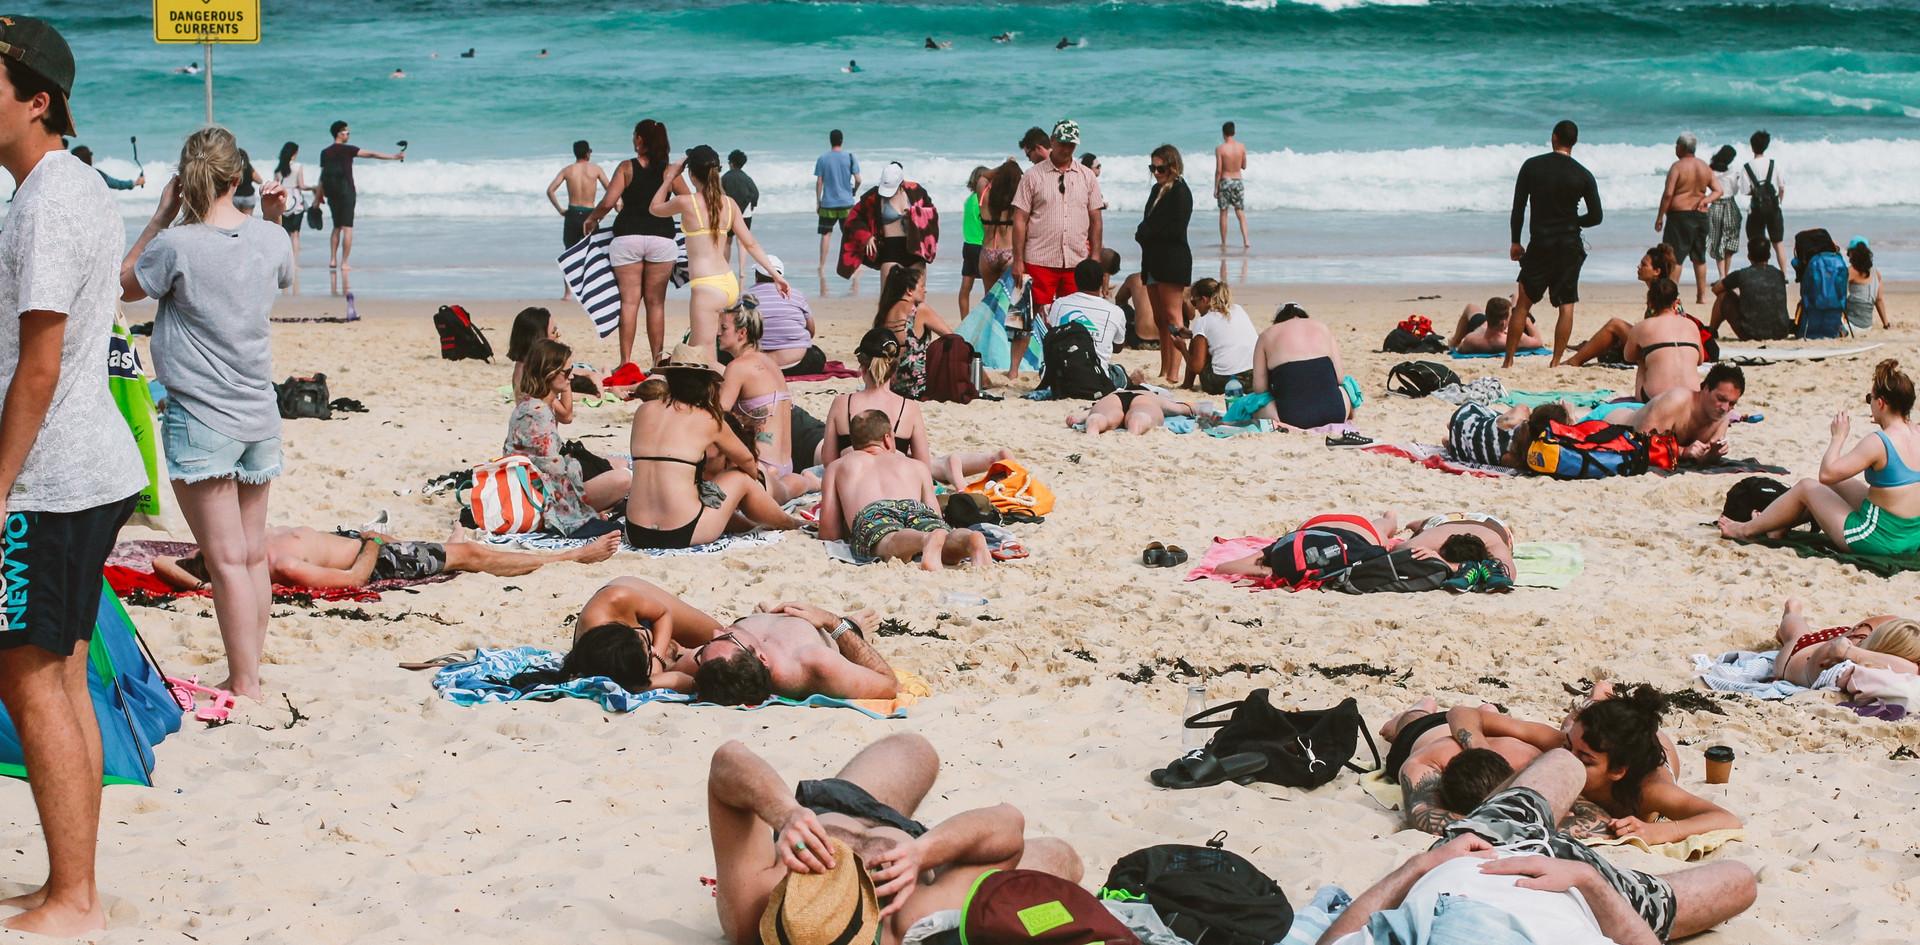 australia-beach-bikini-785066.jpg